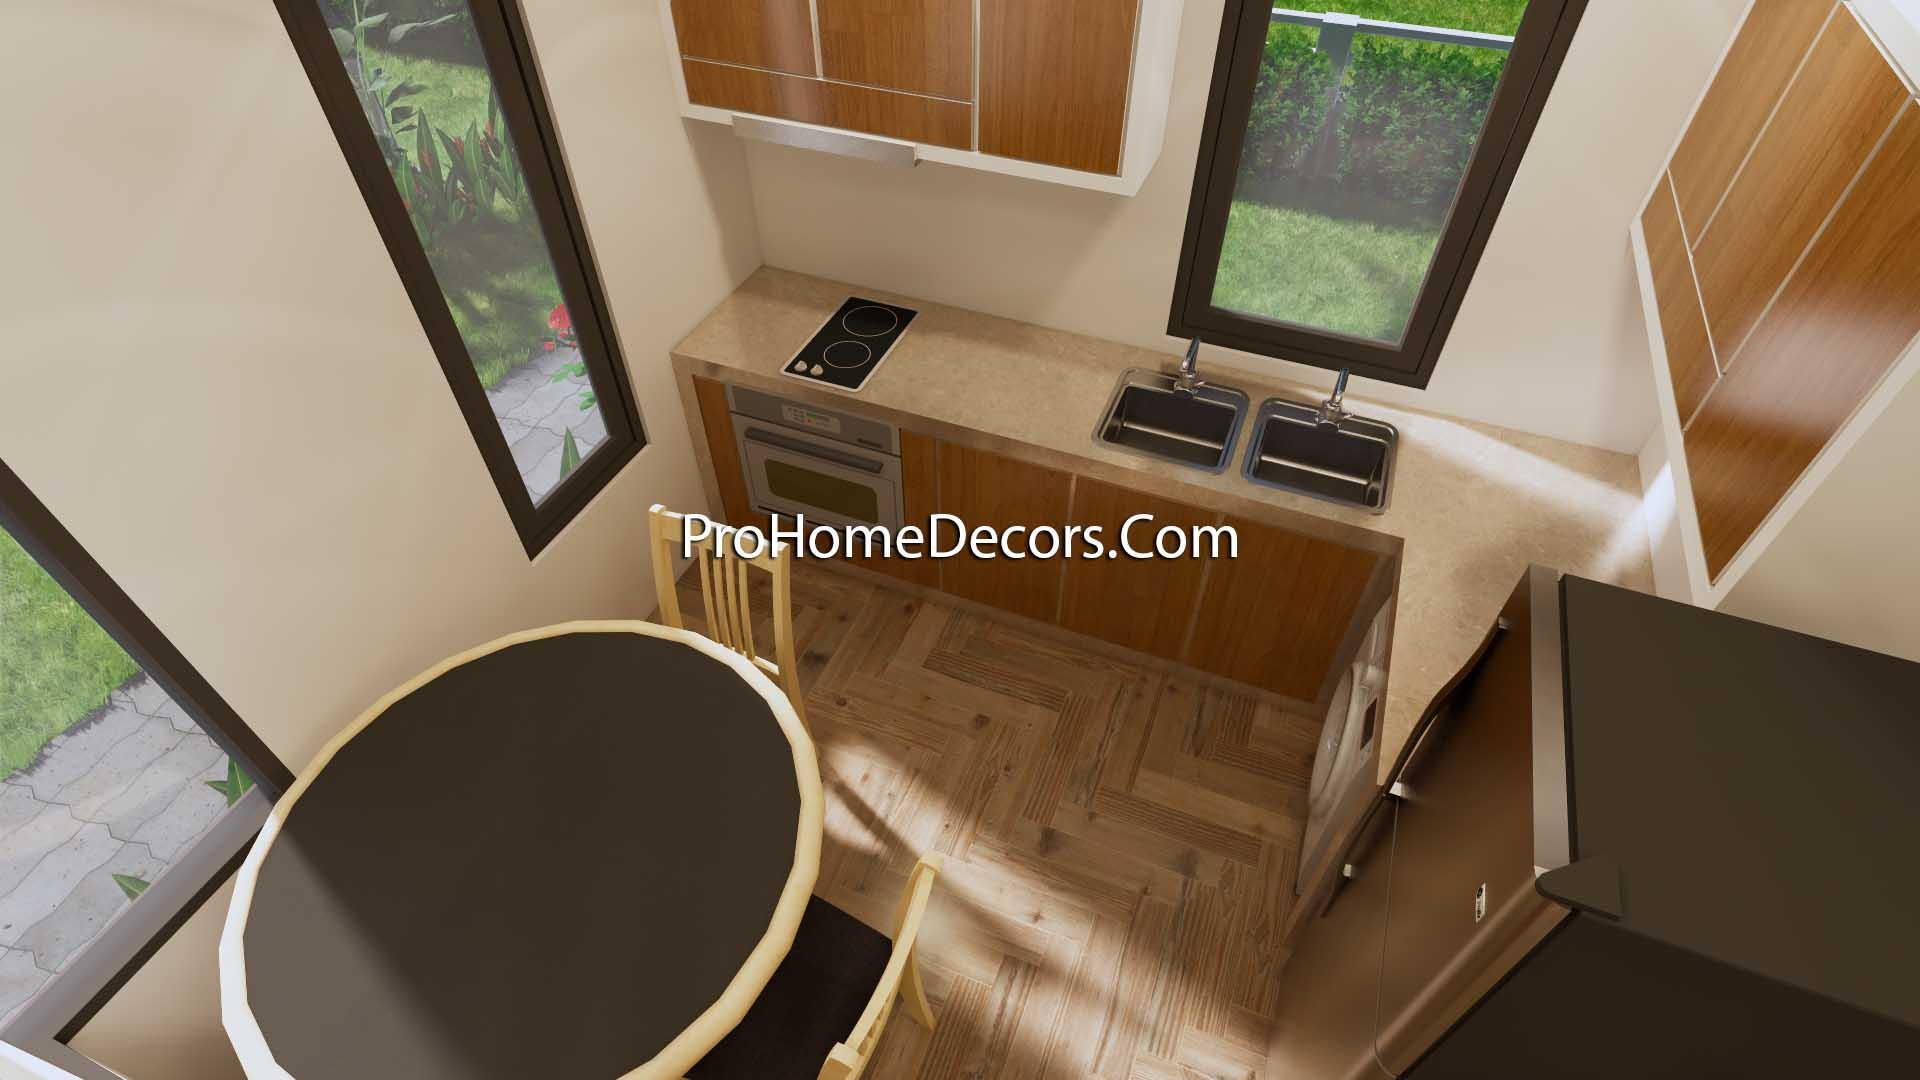 Small Home Design 6.5x6 Meter 22x20 Feet Hip Roof Kitchen 1